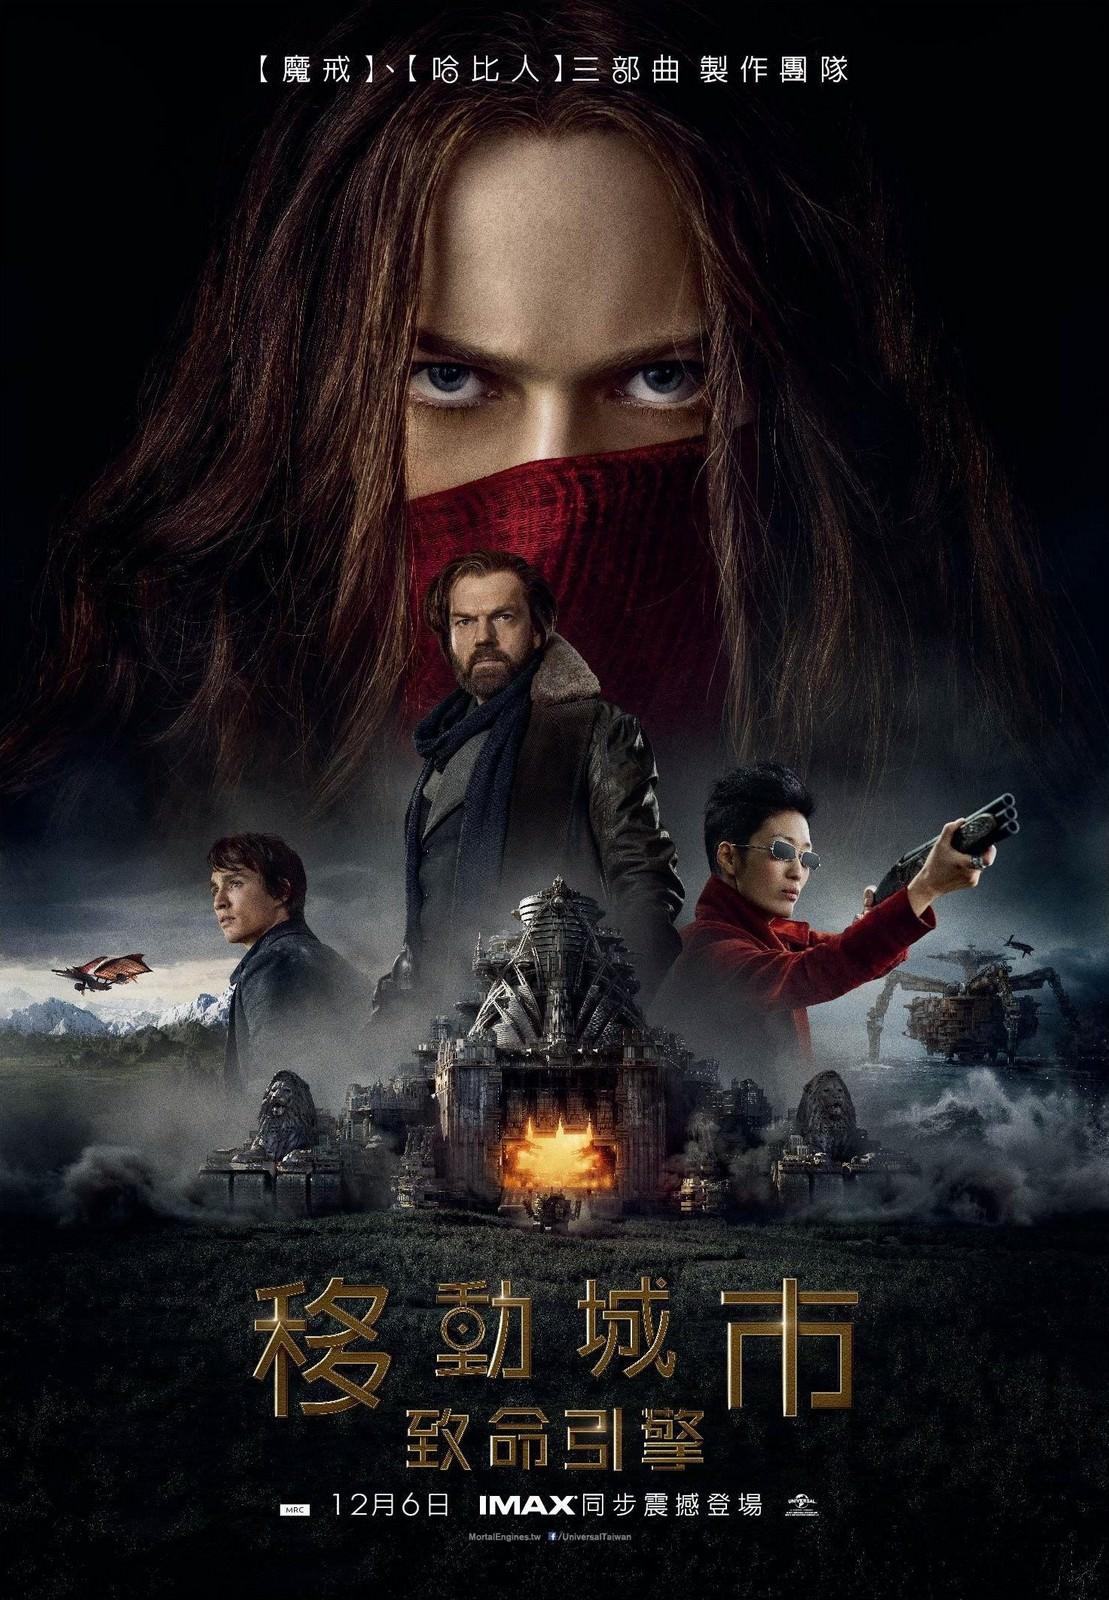 Movie, Mortal Engines(美國, 2018年) / 移動城市:致命引擎(台灣.香港) / 掠食城市(網路), 電影海報, 台灣